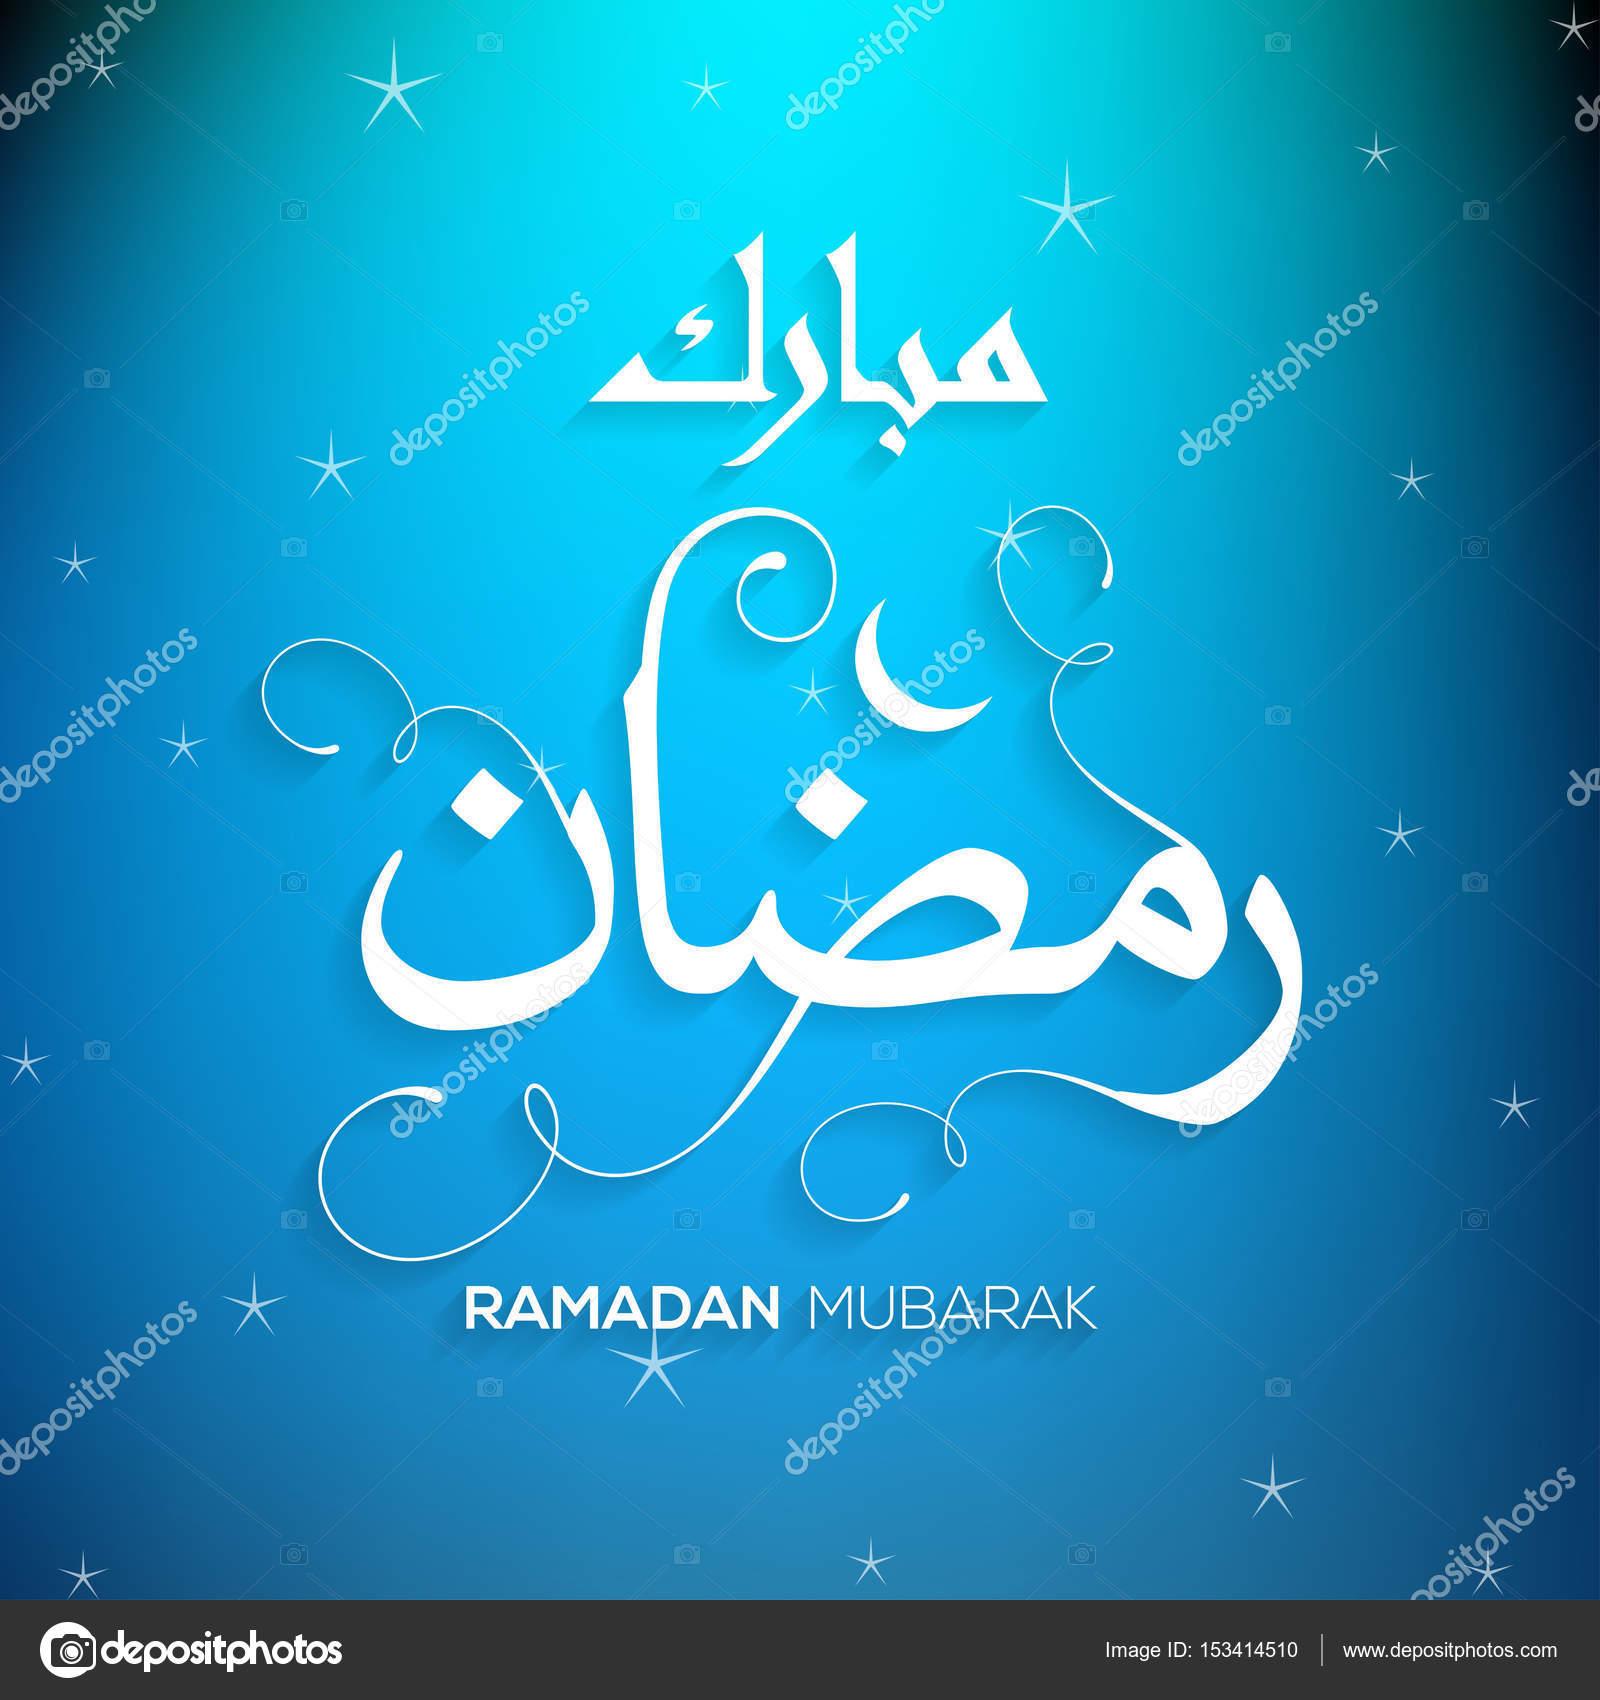 Ramadan mubarak greeting card stock vector ibrandify 153414510 beautiful greeting card with arabic calligraphy ramadan mubarak vector by ibrandify m4hsunfo Choice Image